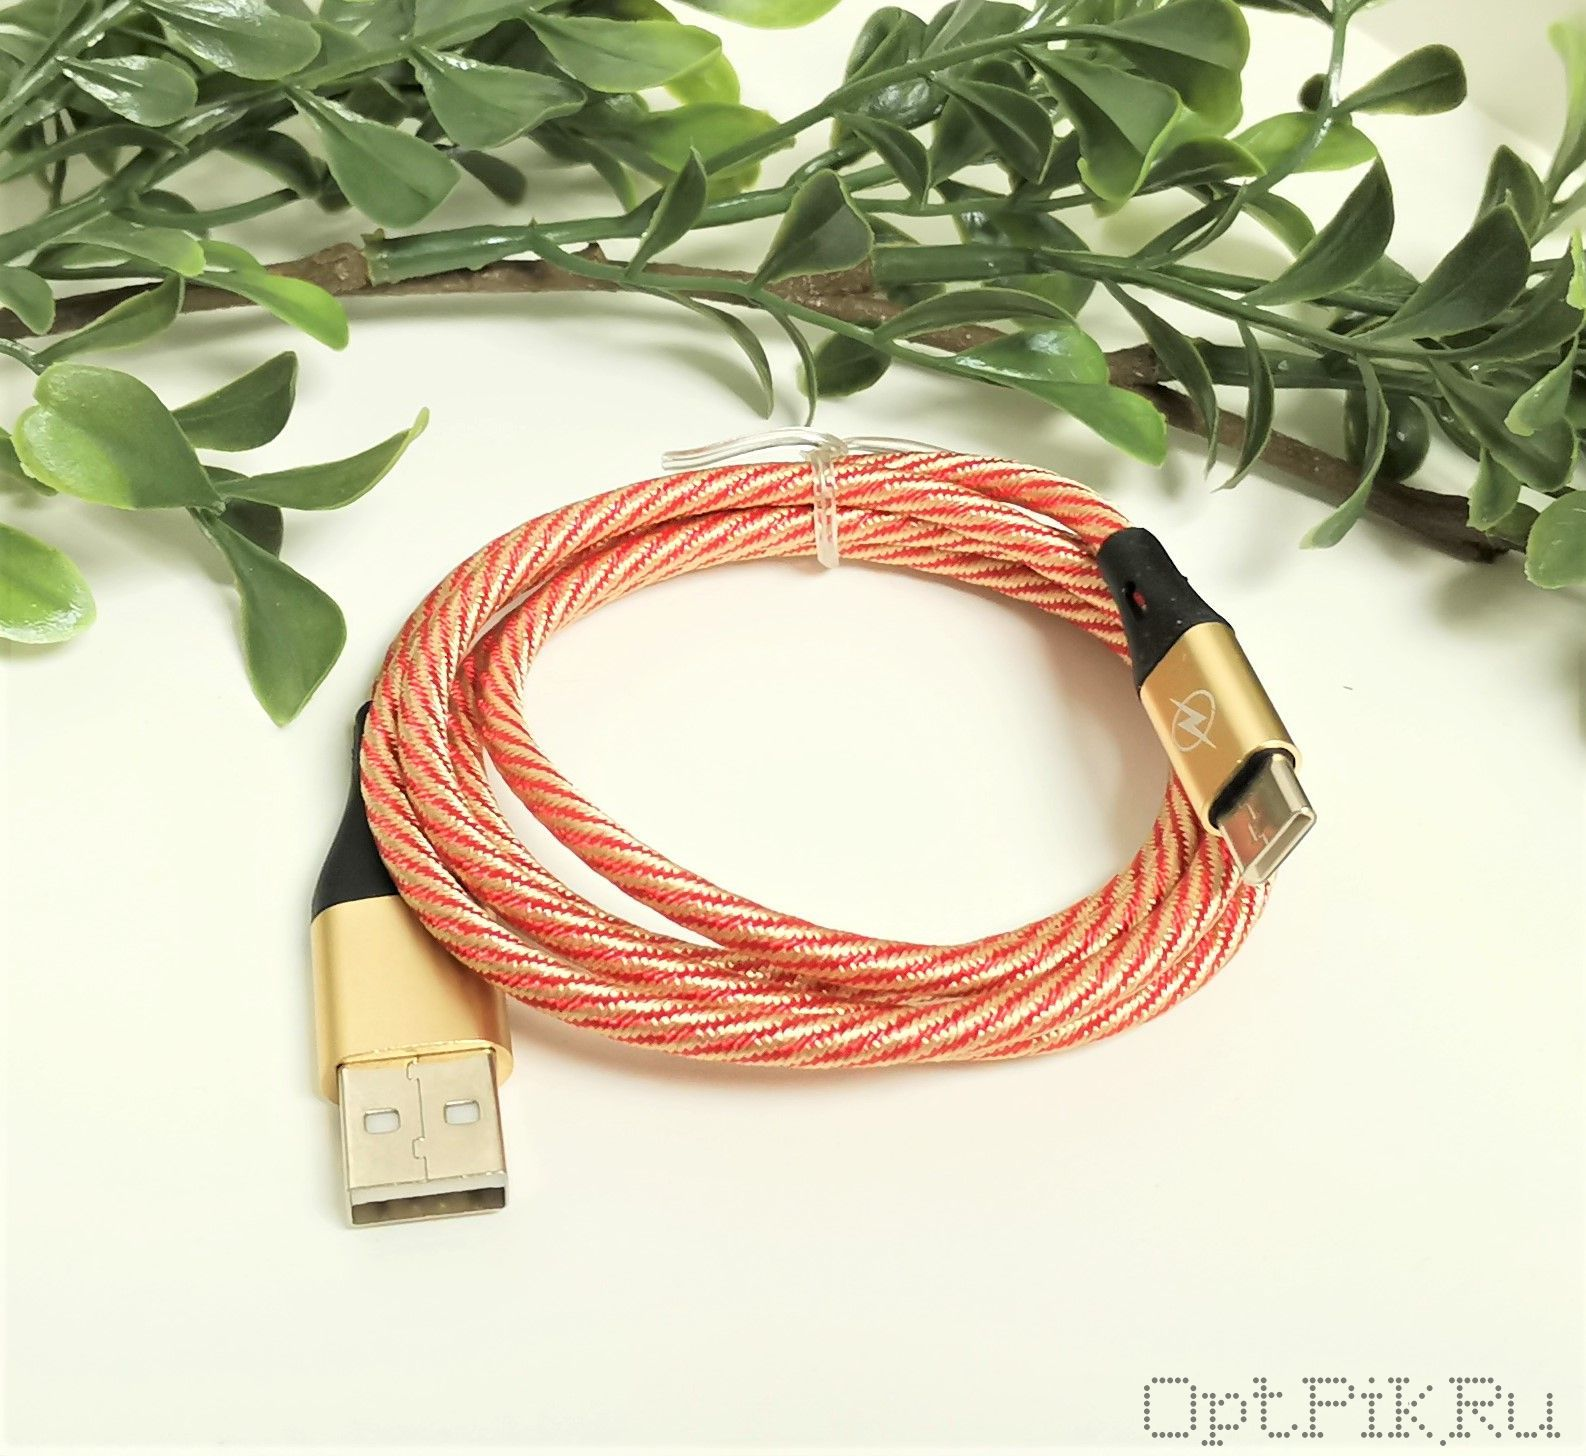 Кабель USB - Type-C 1 метр для зарядки